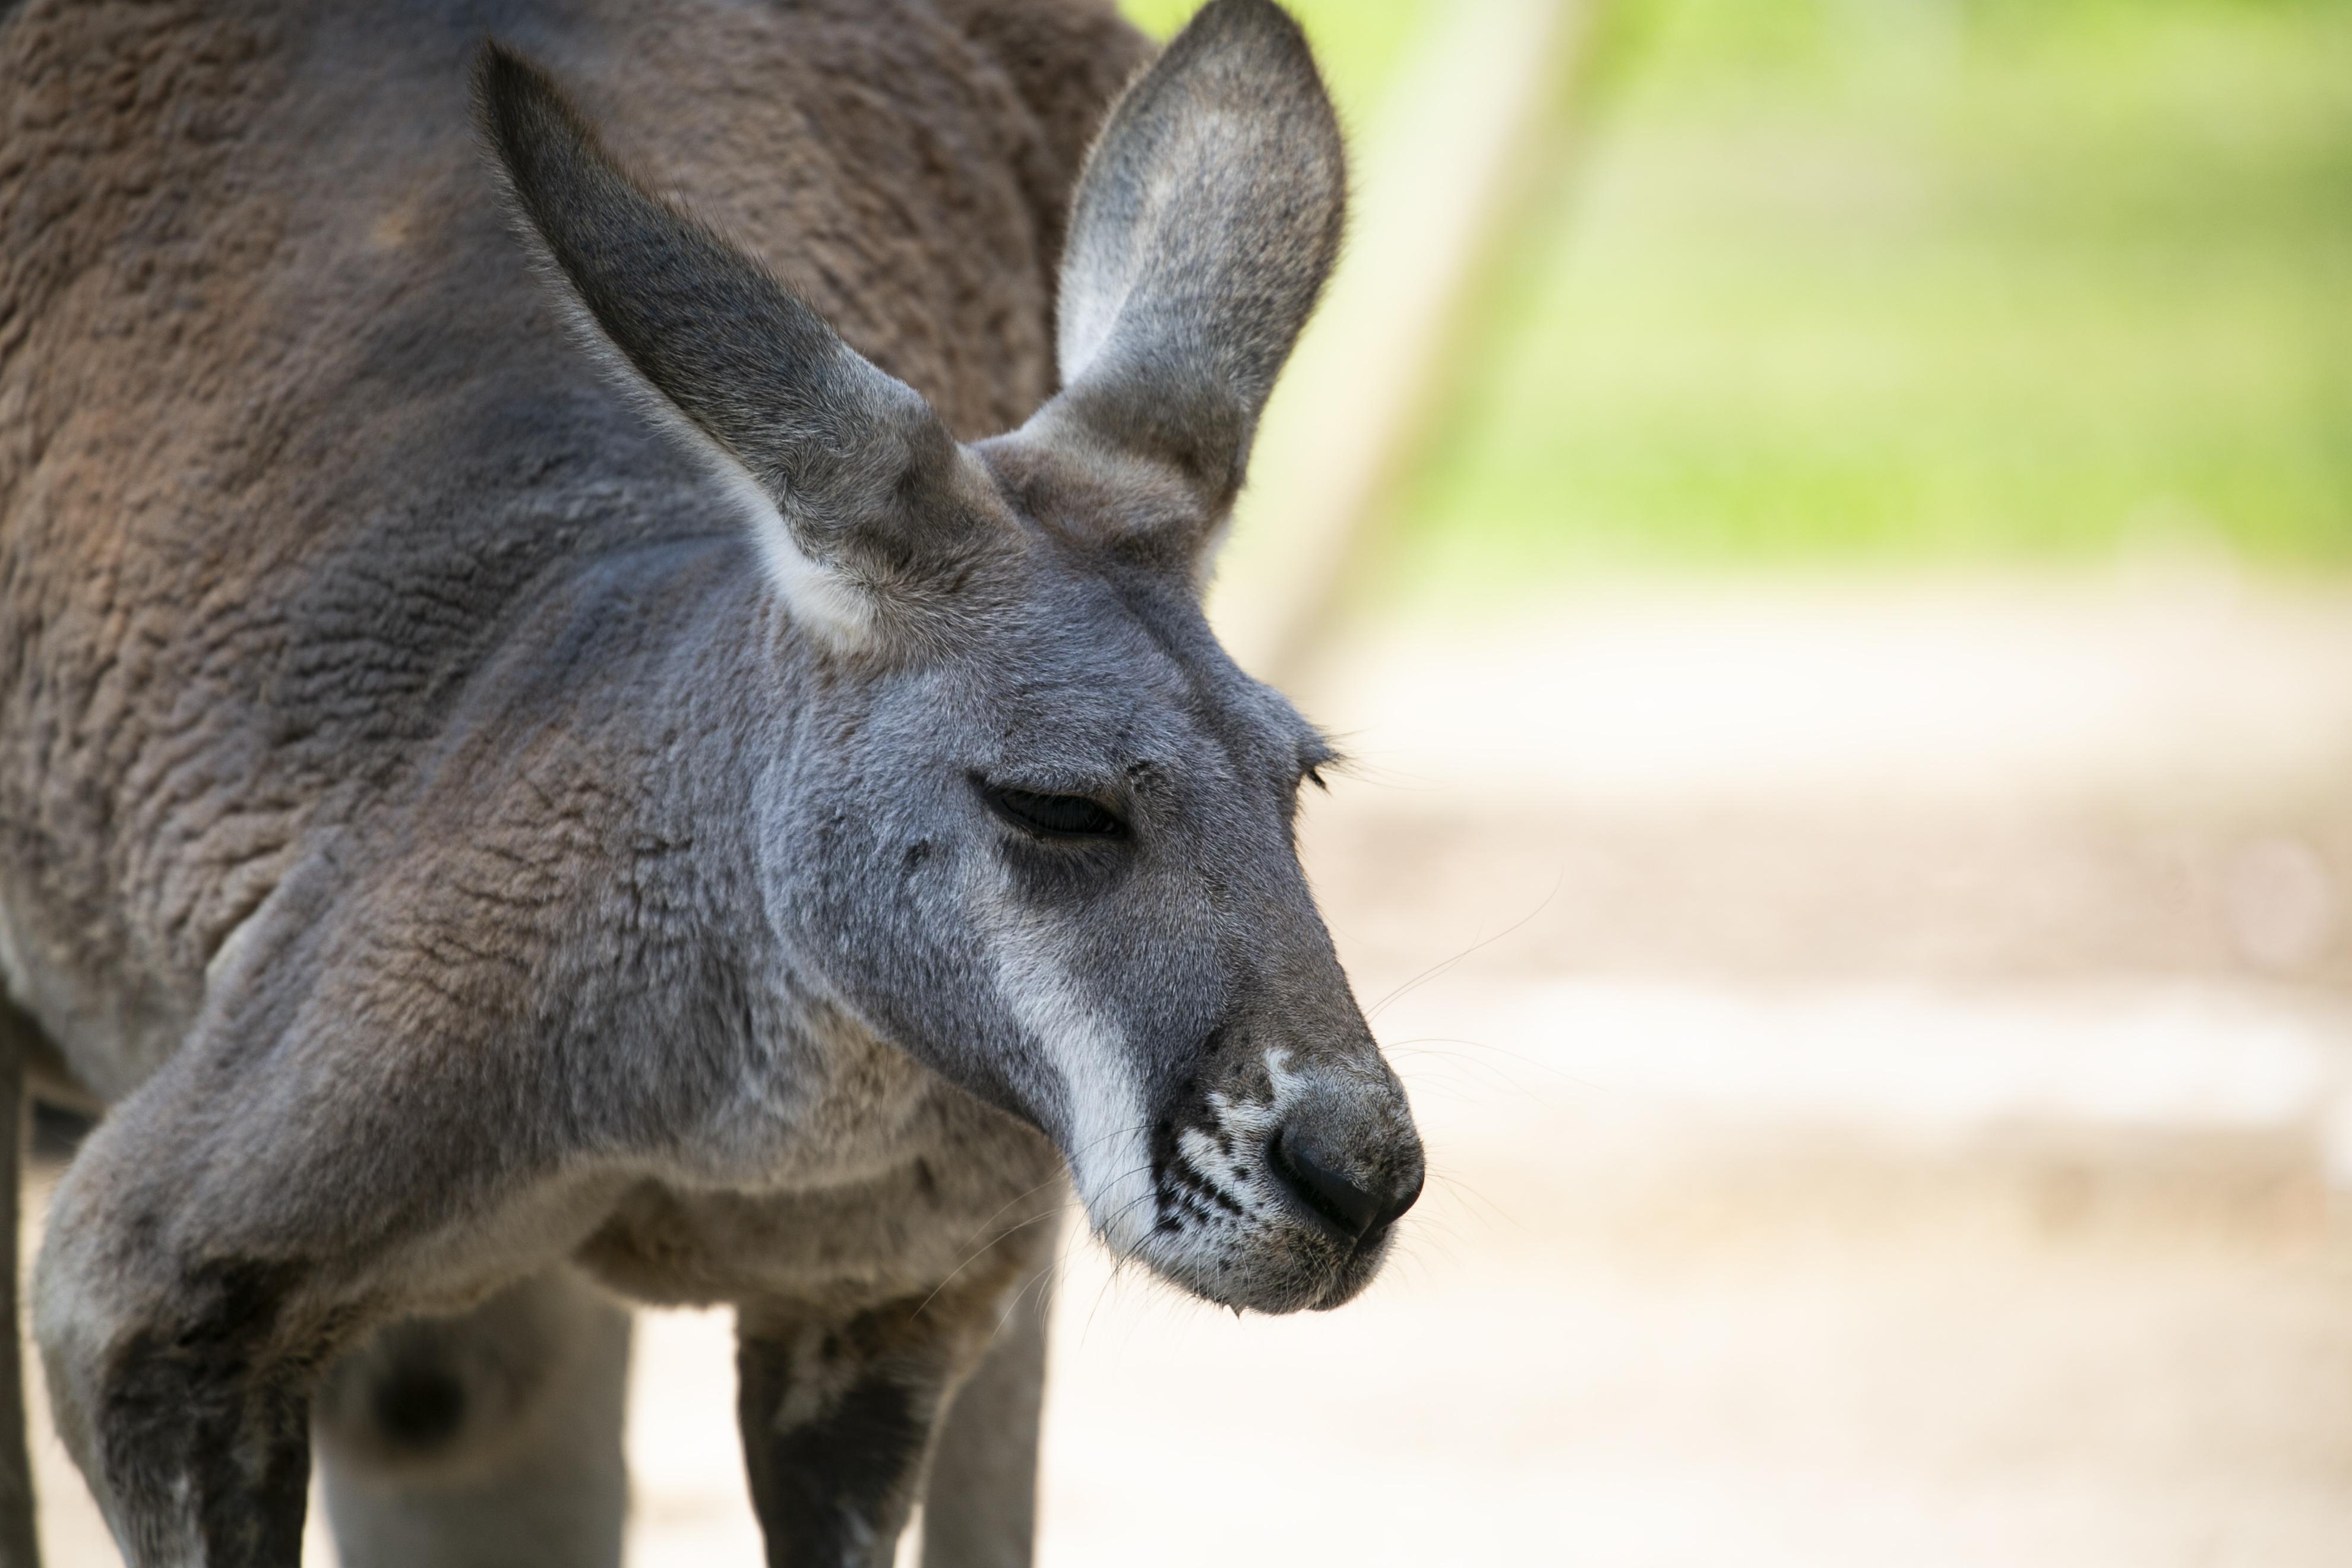 Lazy Kangaroo, Eastern Grey Kangaroo (Macropus giganteus) Tidbinbilla Nature Reserve, Australian Capital Territory, Australia